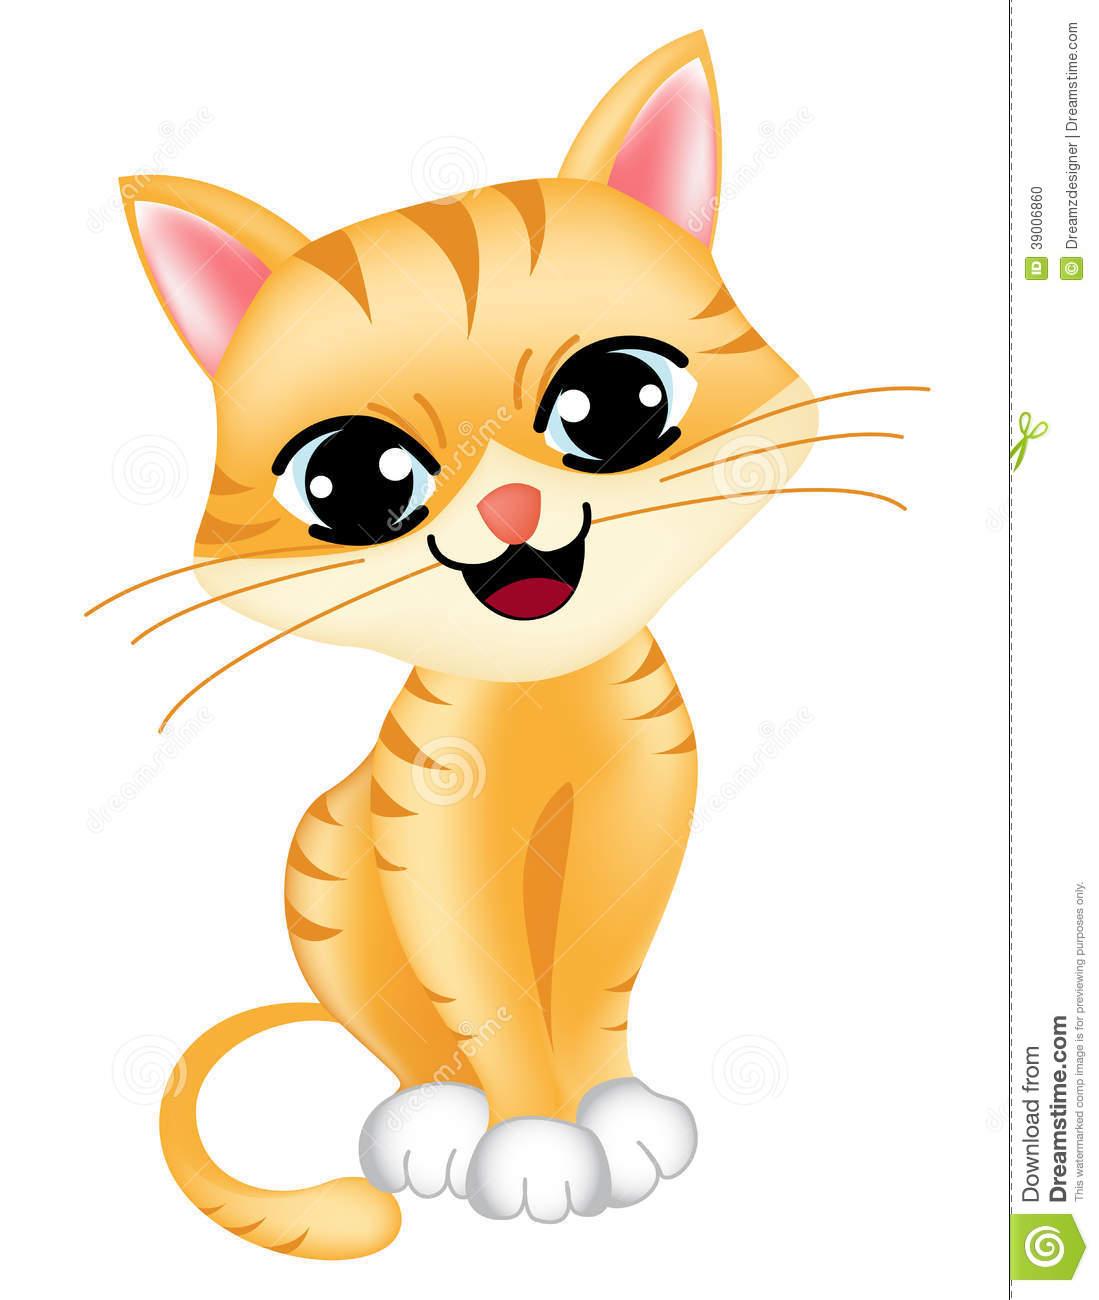 cute kitten clipart cute cat 47fUQW clipart.jpg